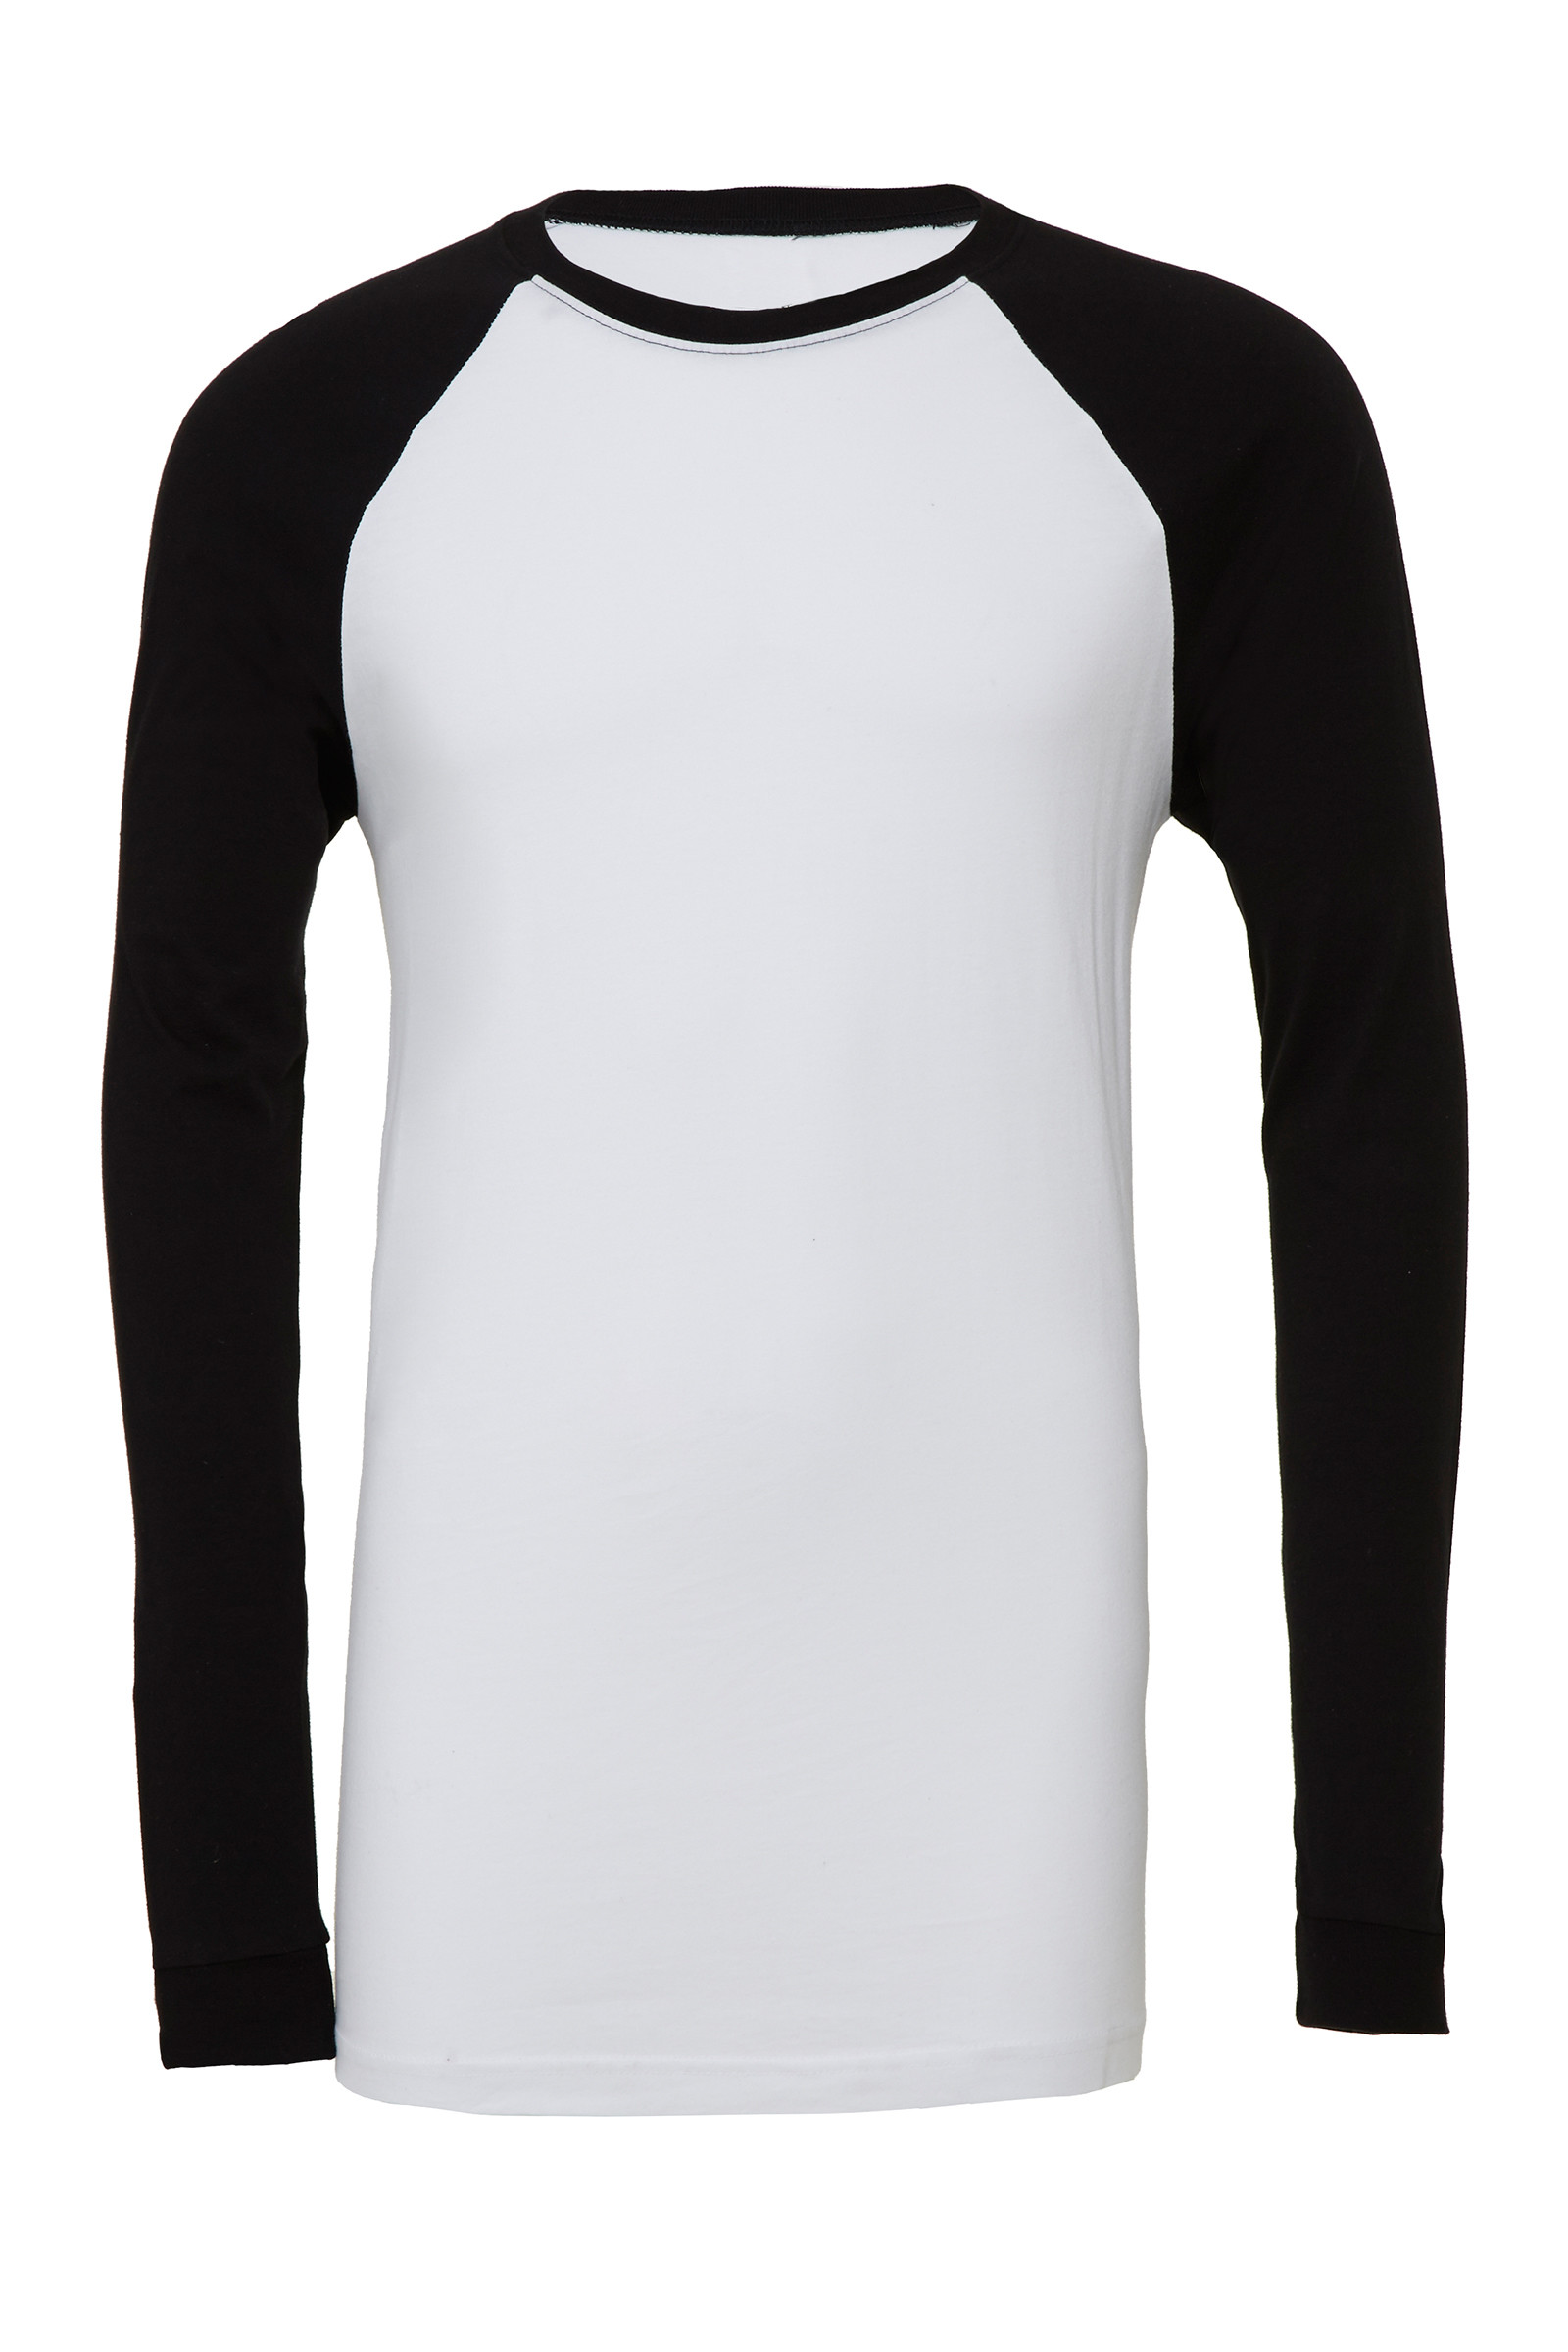 san francisco 04180 bfeab Personalized Jersey Long Sleeve Baseball Tee Shirt